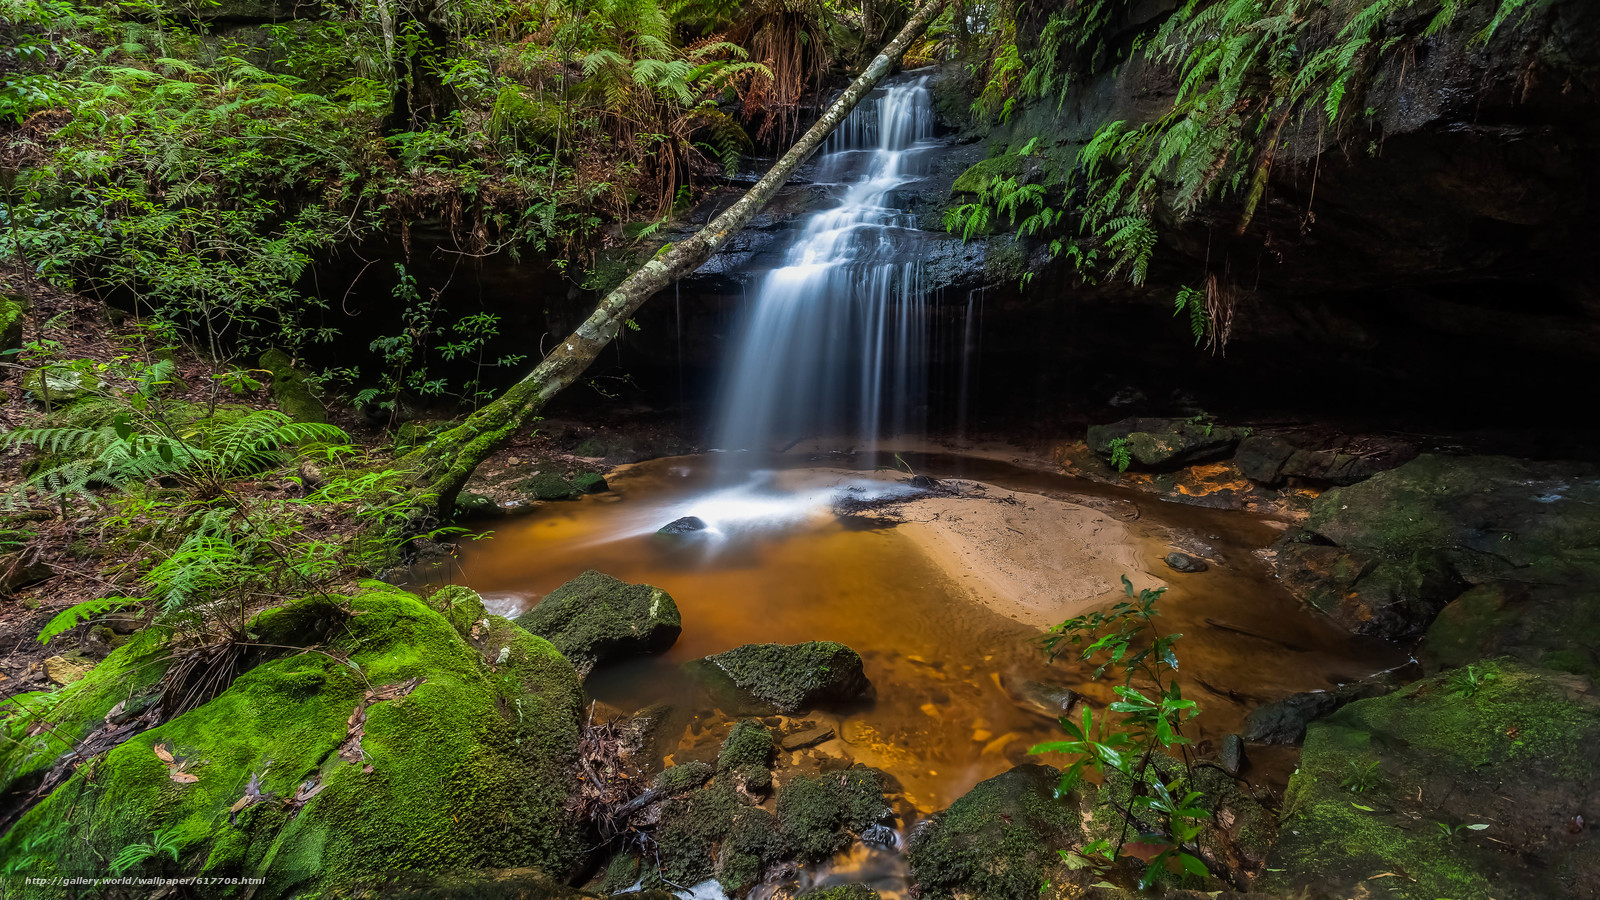 Descargar gratis cascada,  bosque,  árboles,  Rocas Fondos de escritorio en la resolucin 5616x3159 — imagen №617708